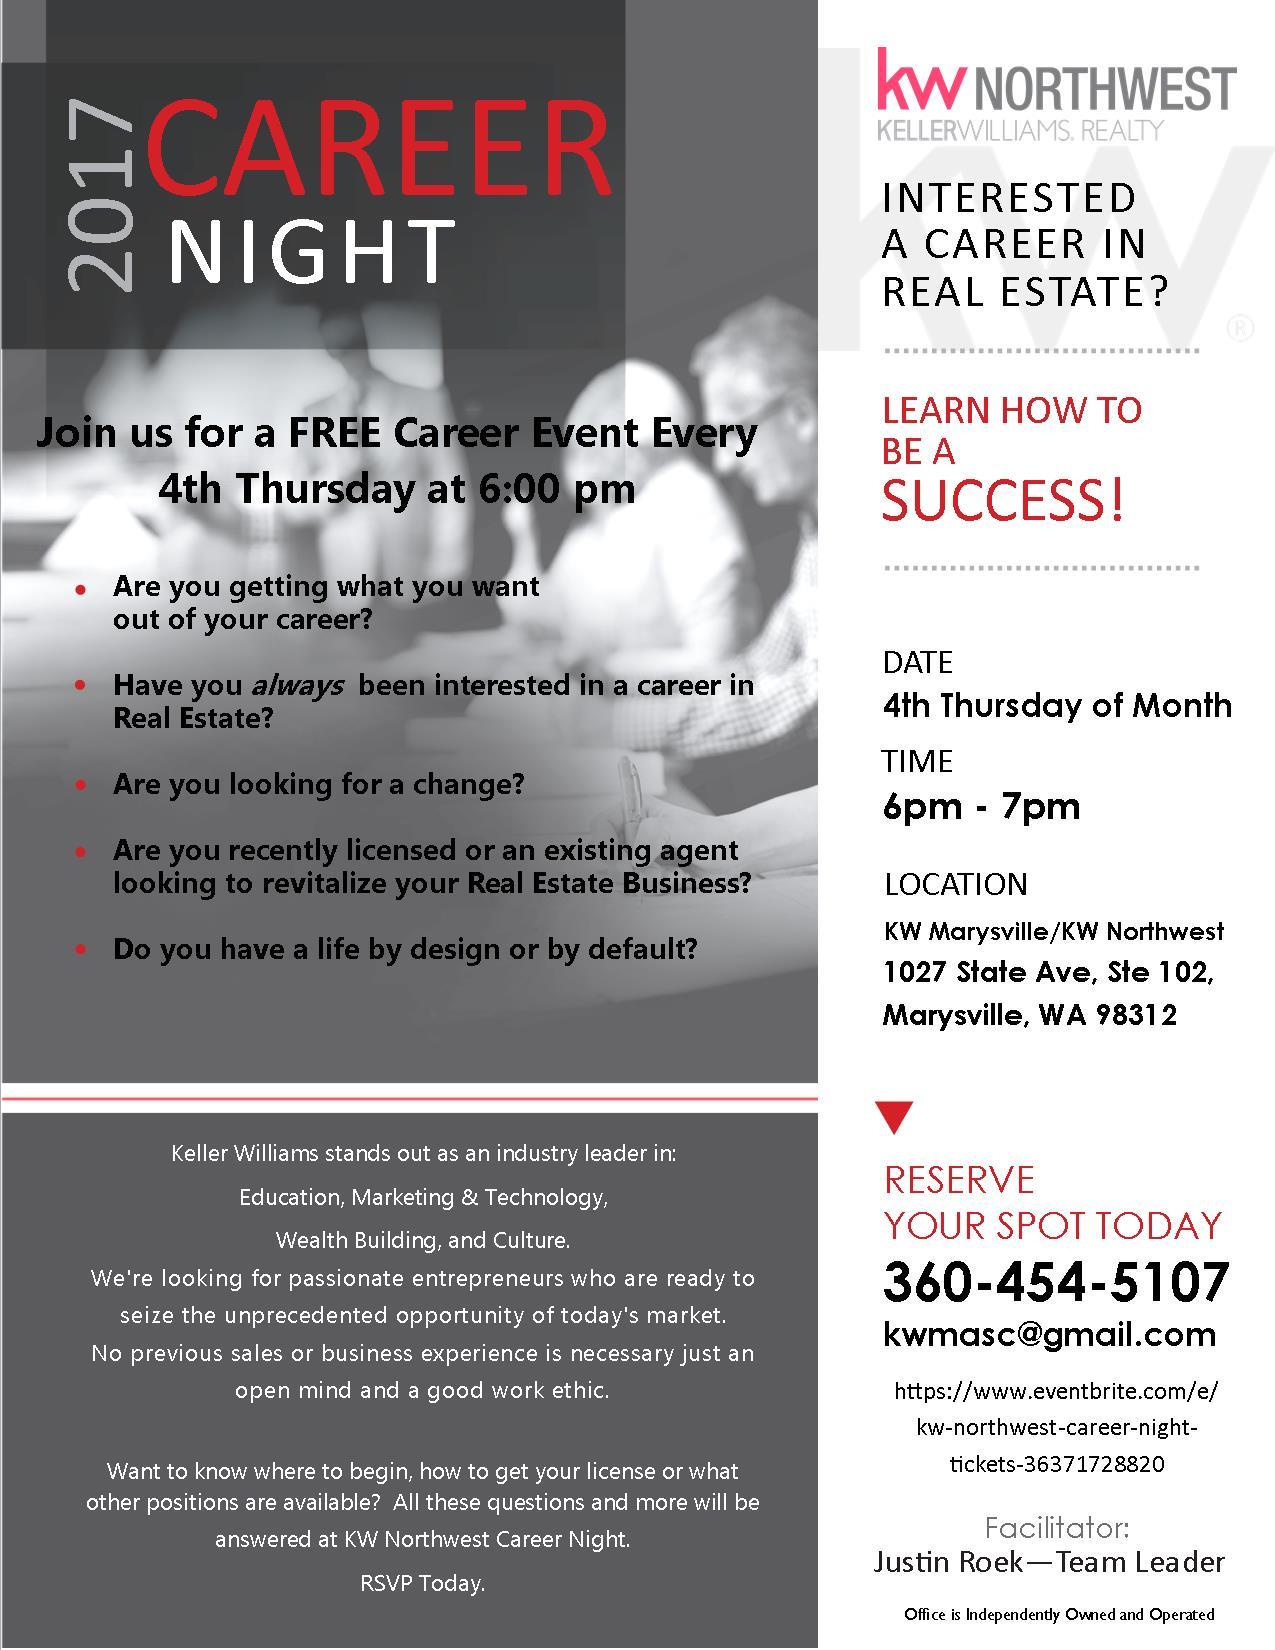 Career Night at KW Northwest